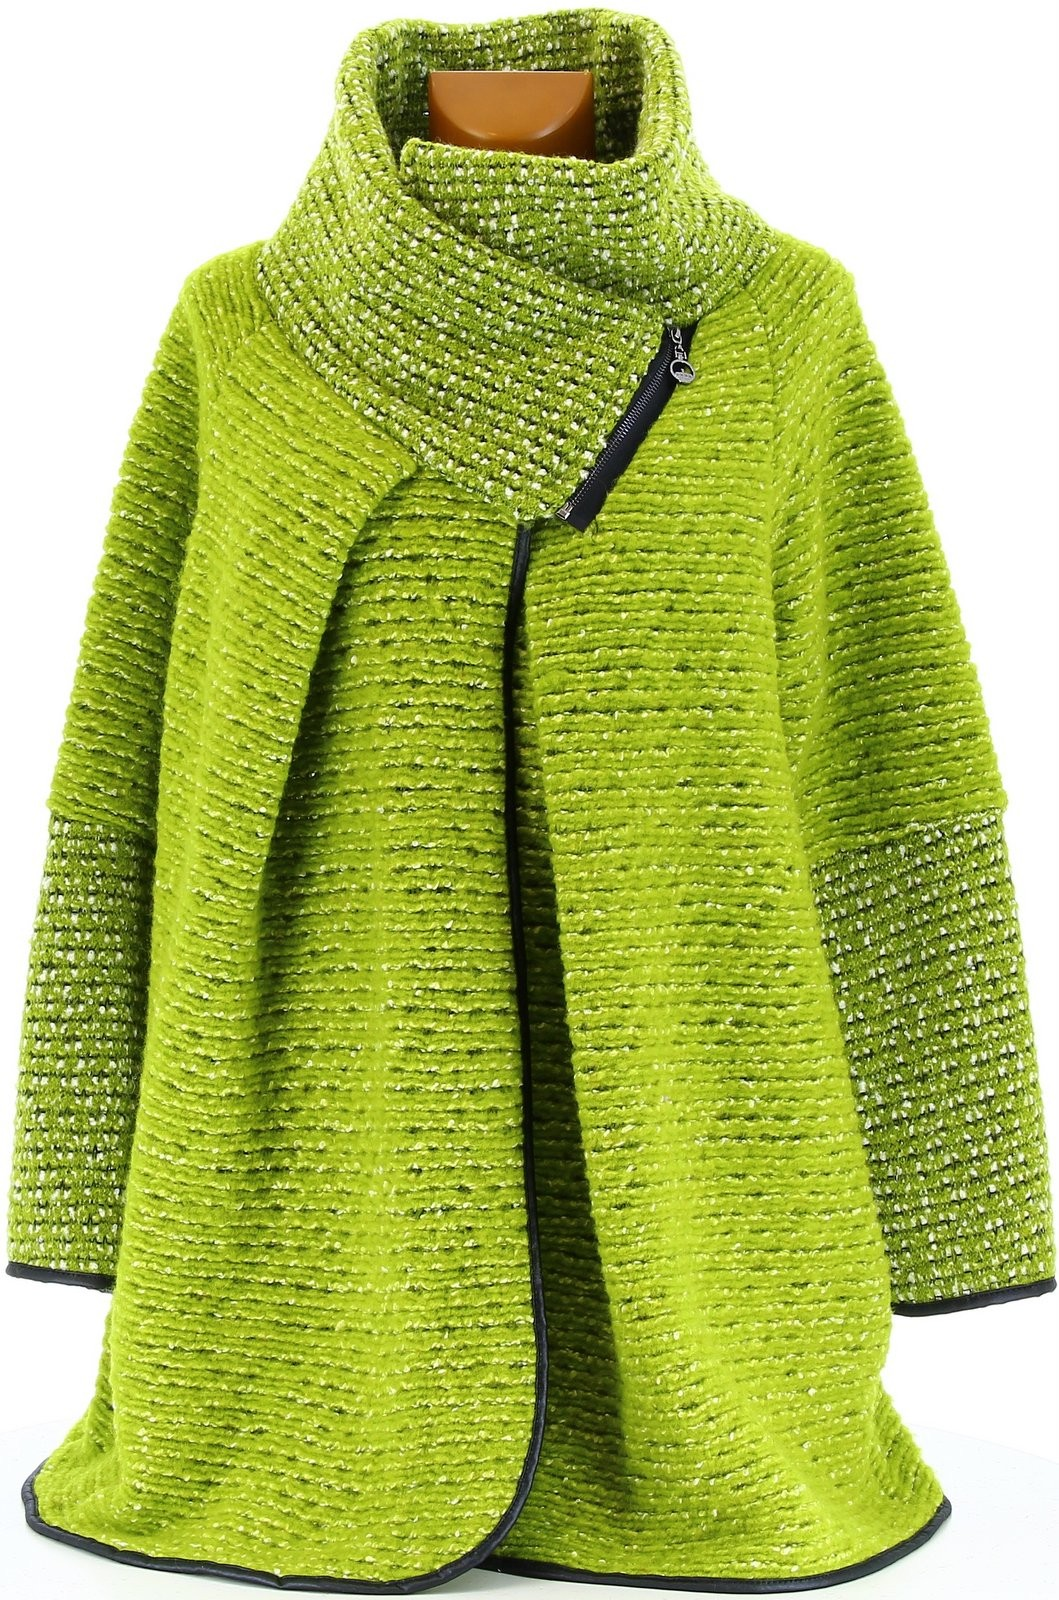 manteau cape laine bouillie hiver grande taille vert. Black Bedroom Furniture Sets. Home Design Ideas